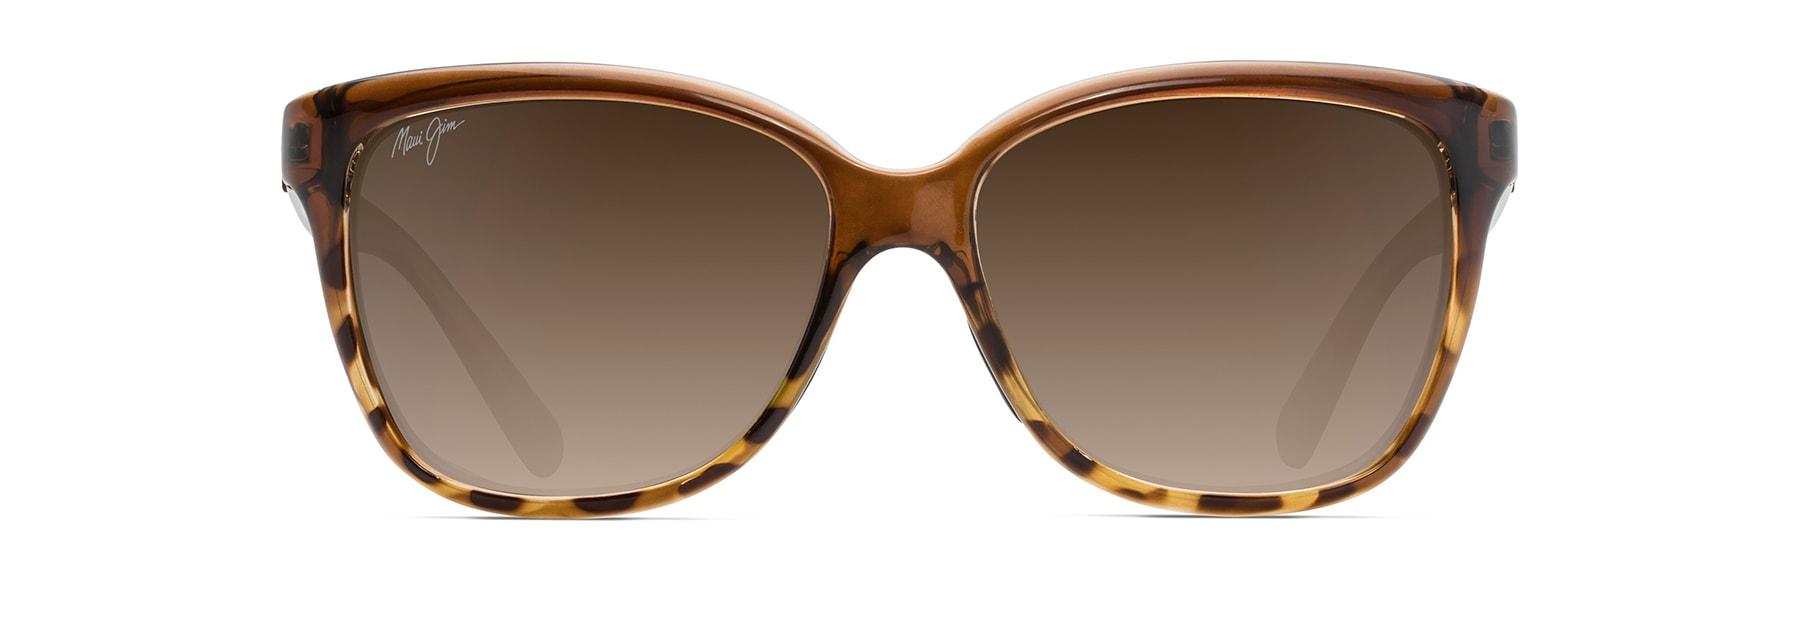 4186aa3227 STARFISH. Polarized Fashion Sunglasses